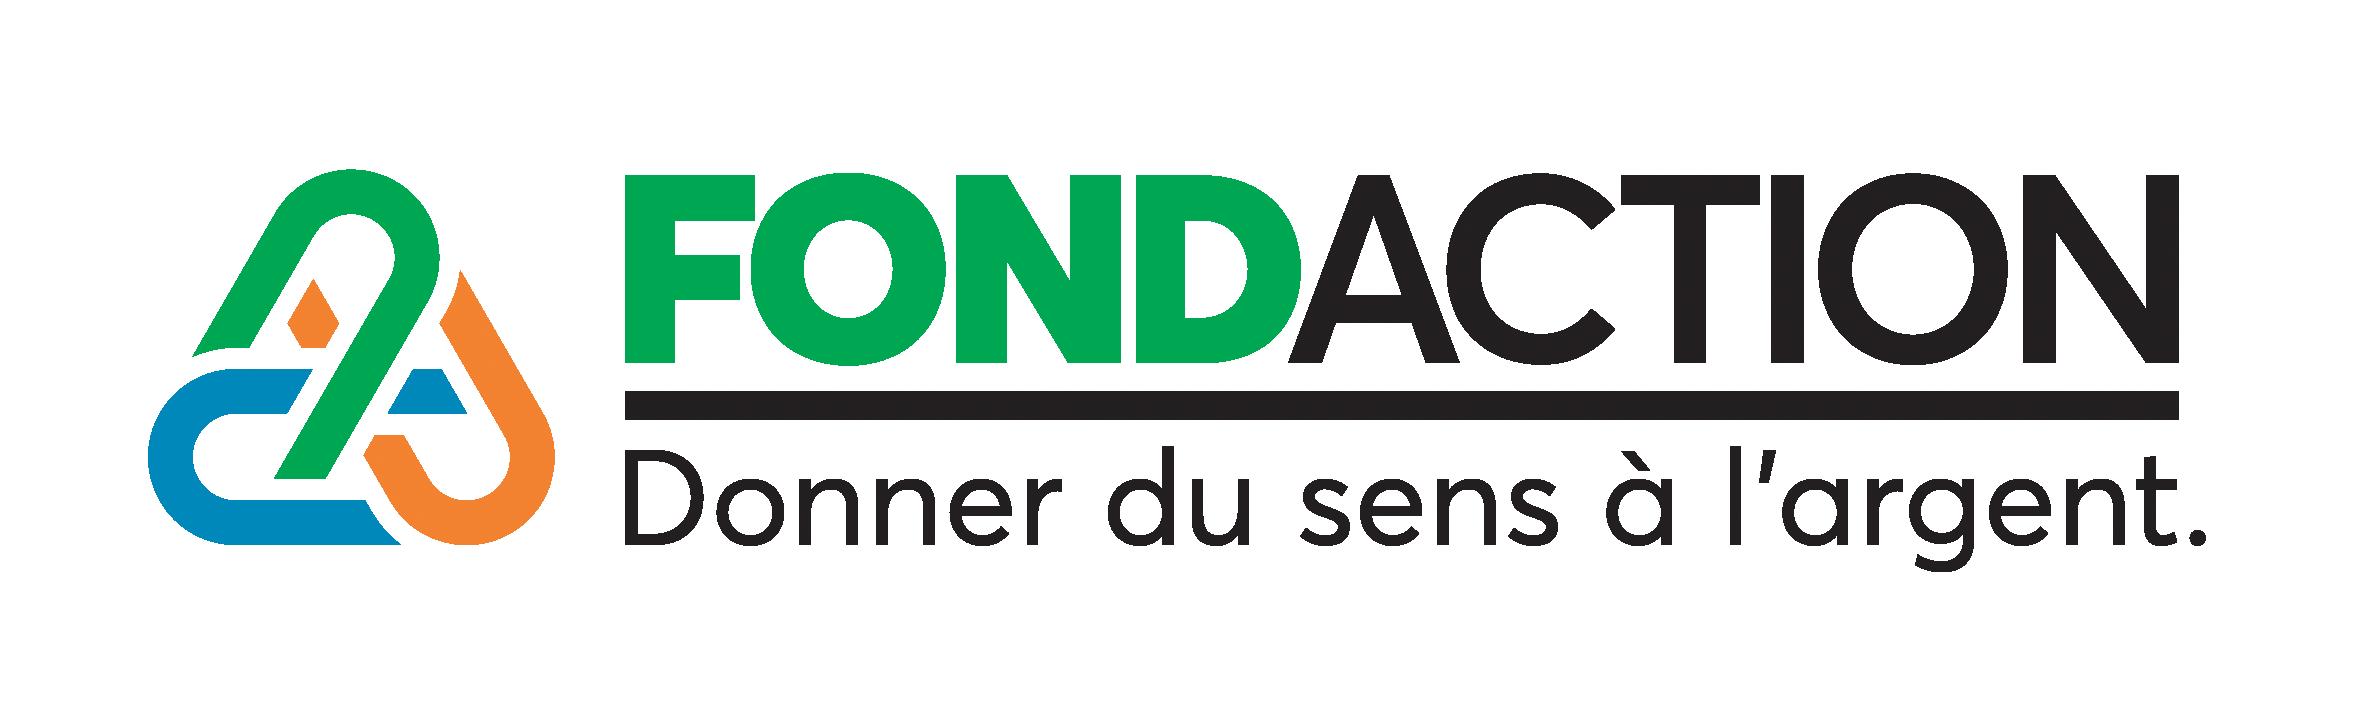 Fondaction_logo_cmykFINAL